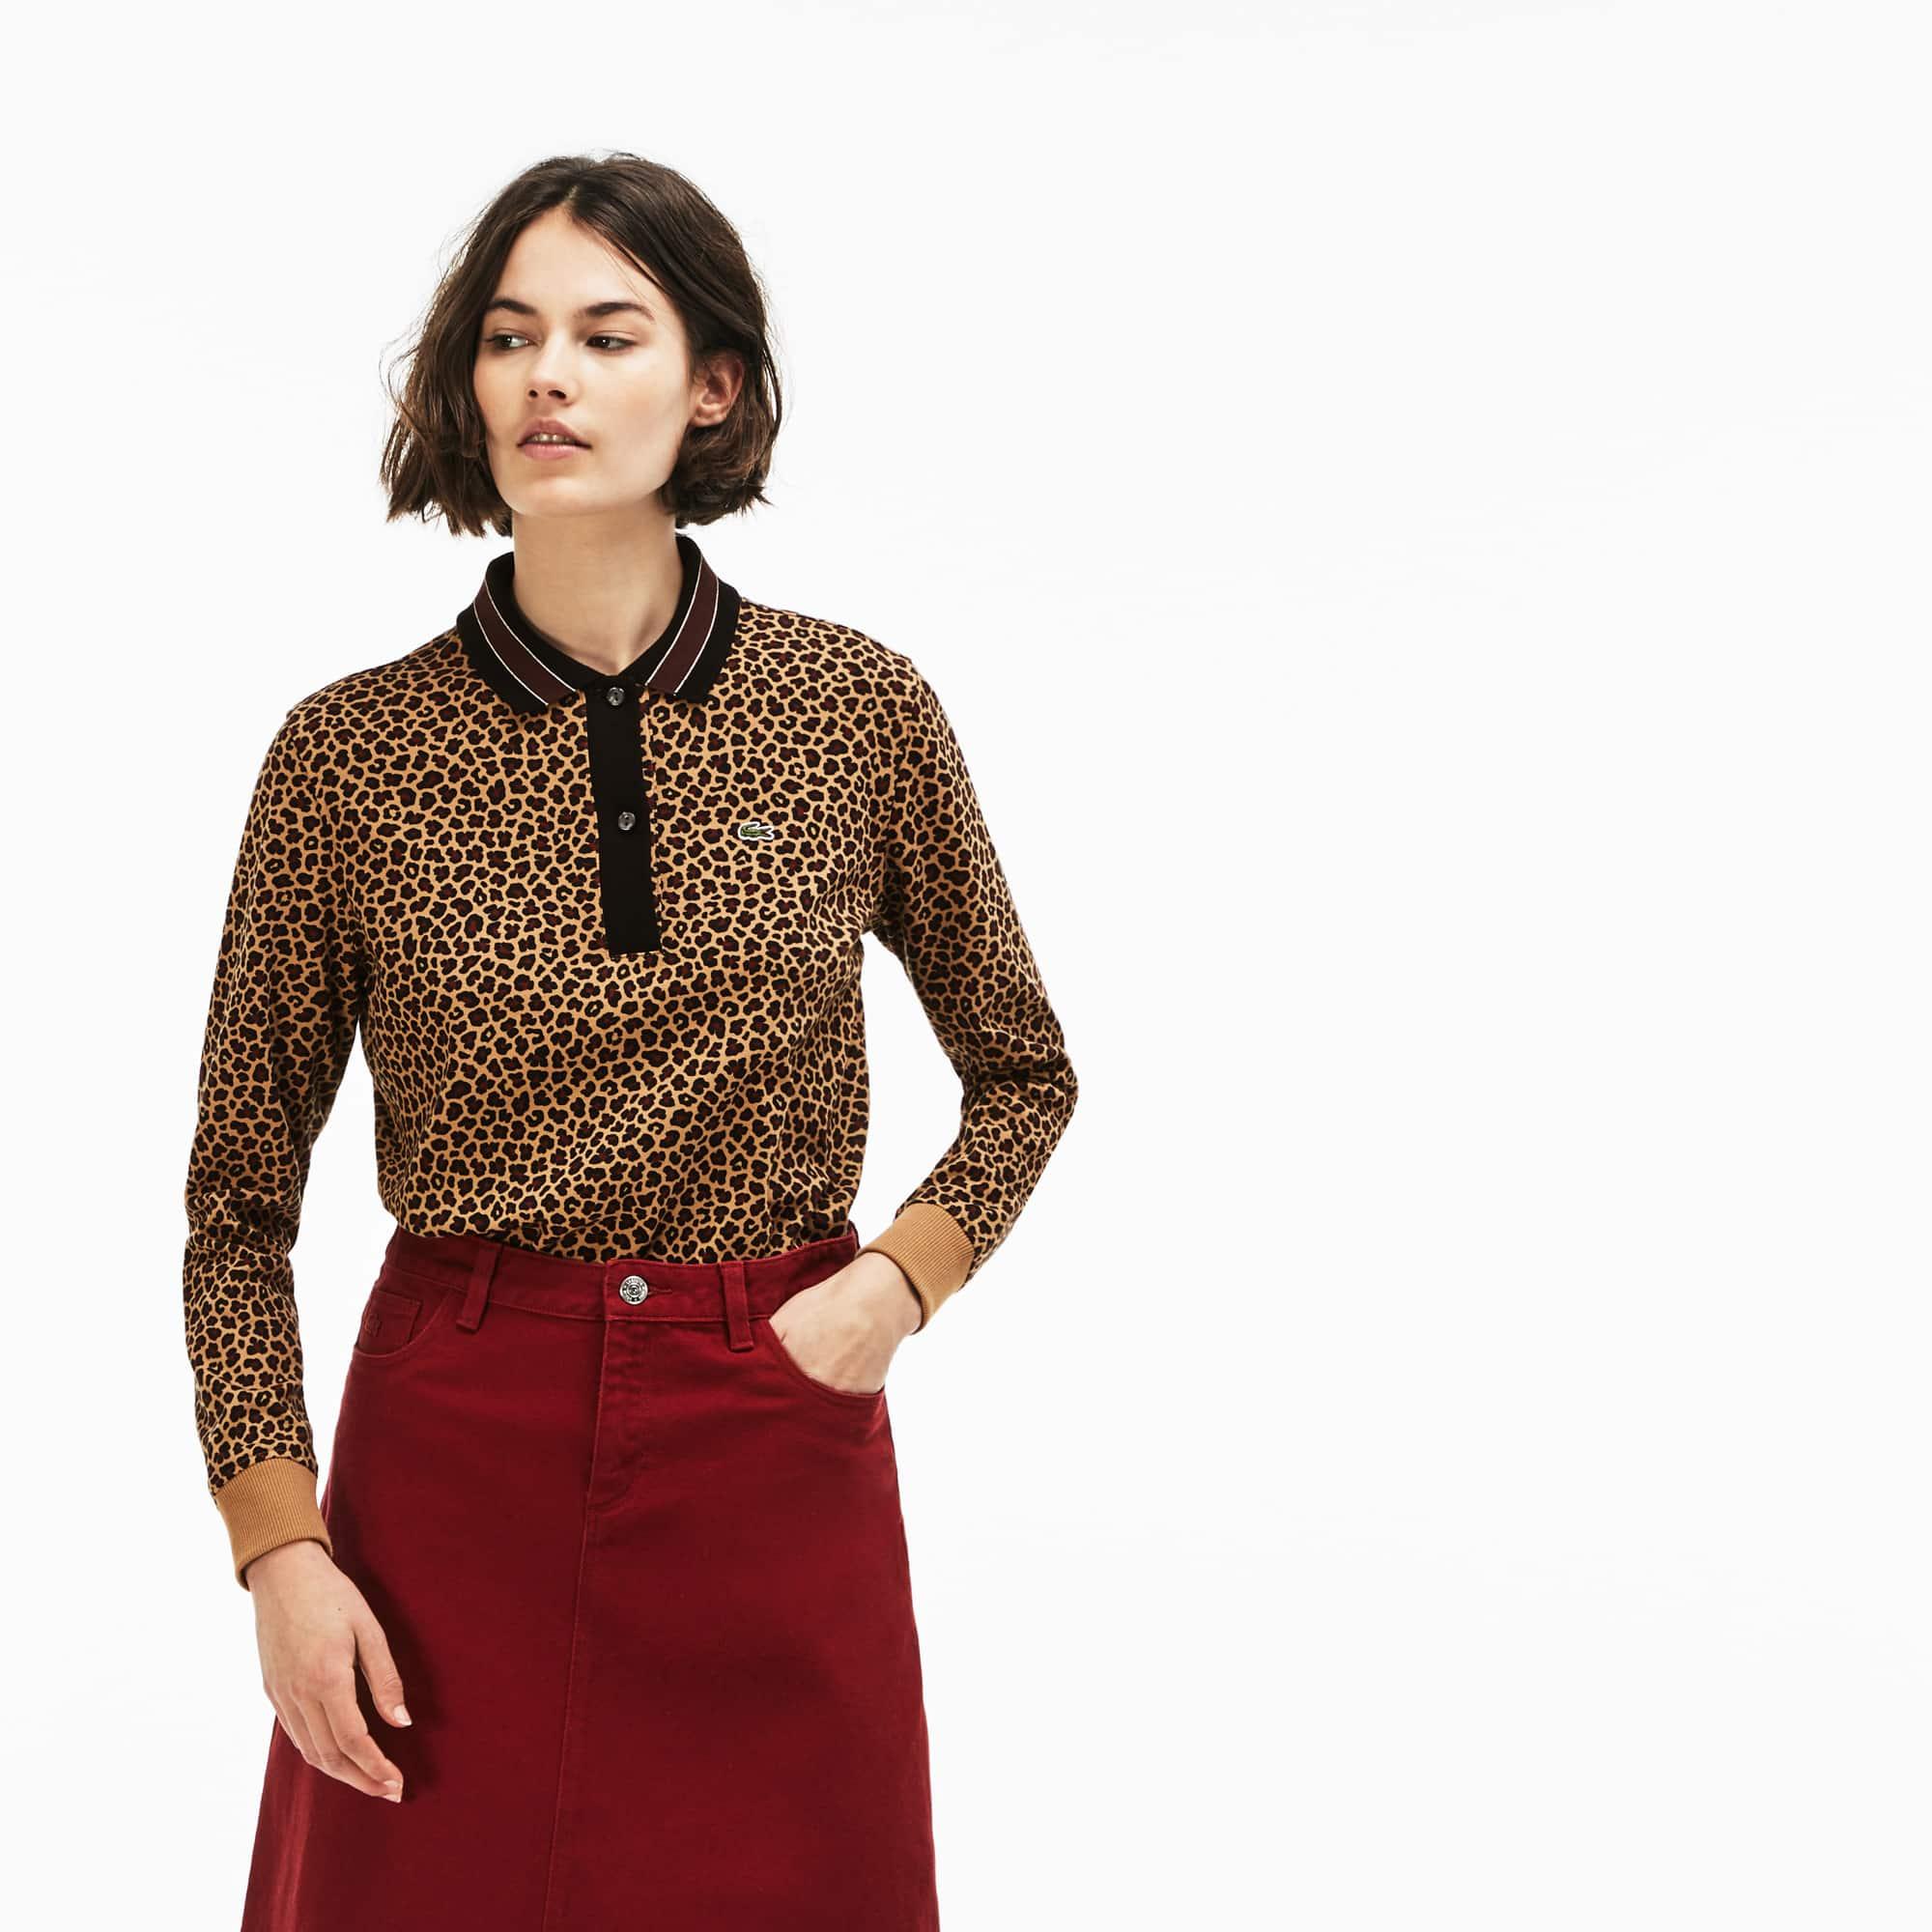 Damen LACOSTE L!VE Interlock-Poloshirt mit Leopard-Print